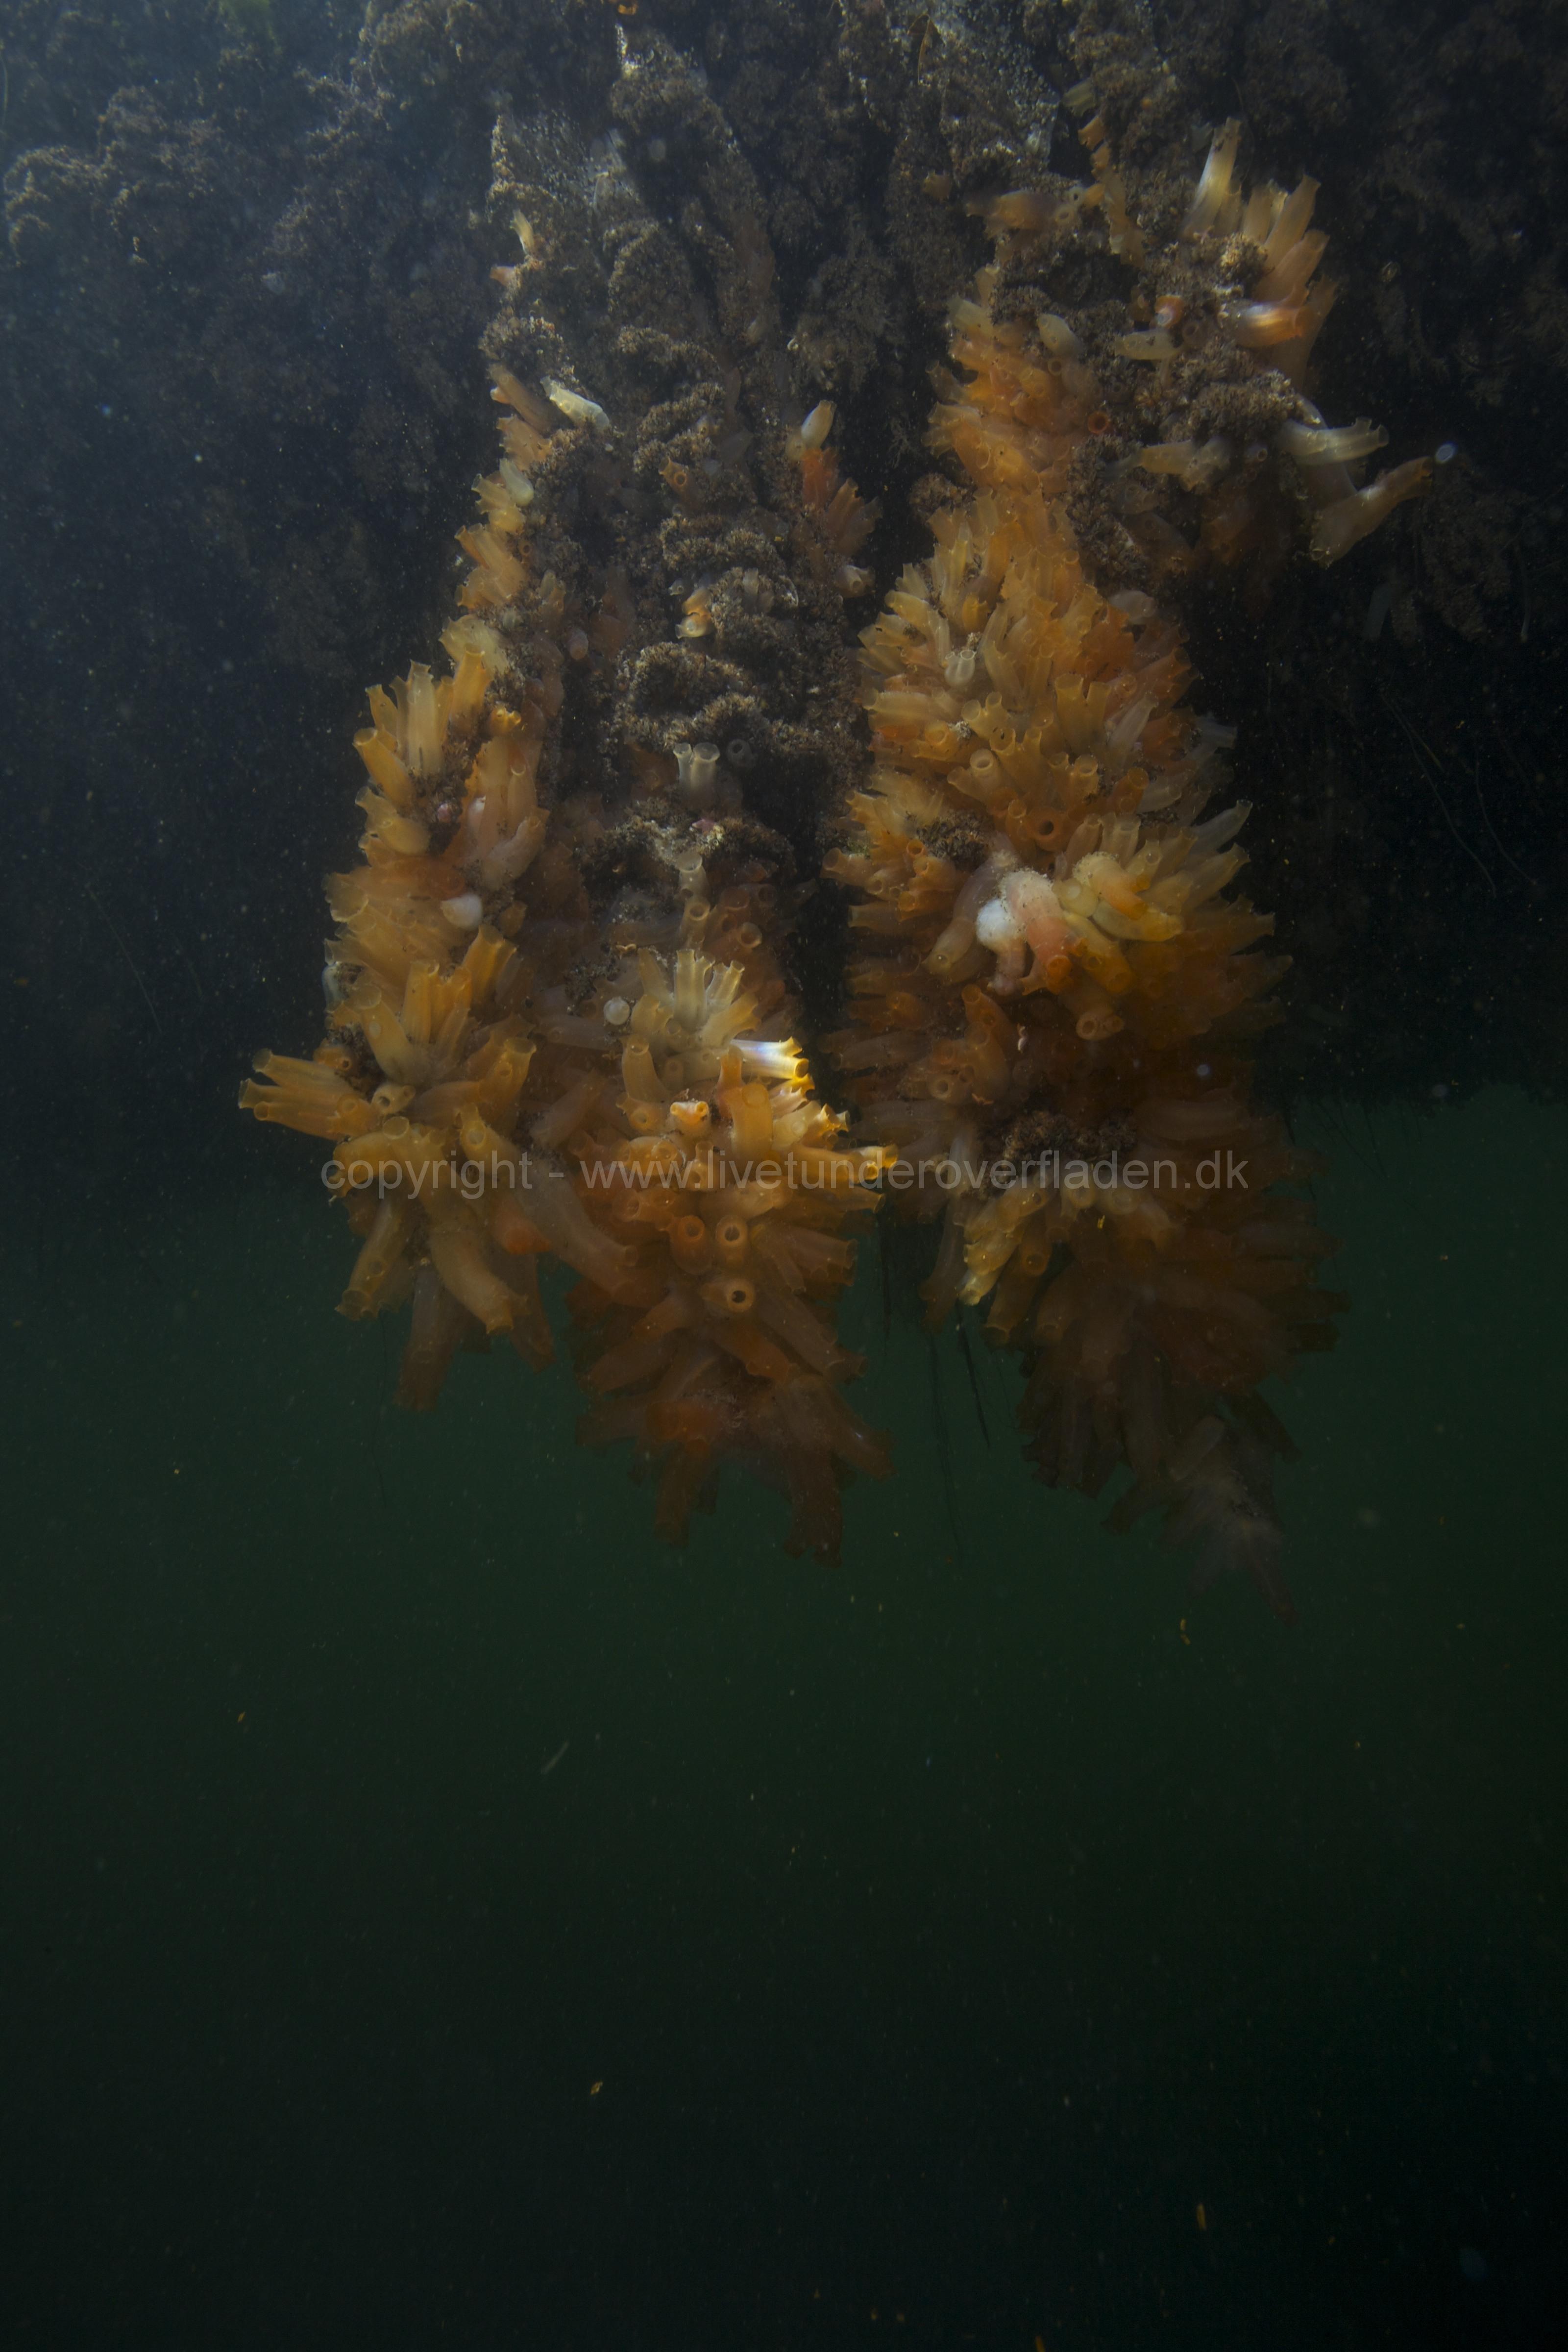 Marine habitat_Martin_Kielland 42